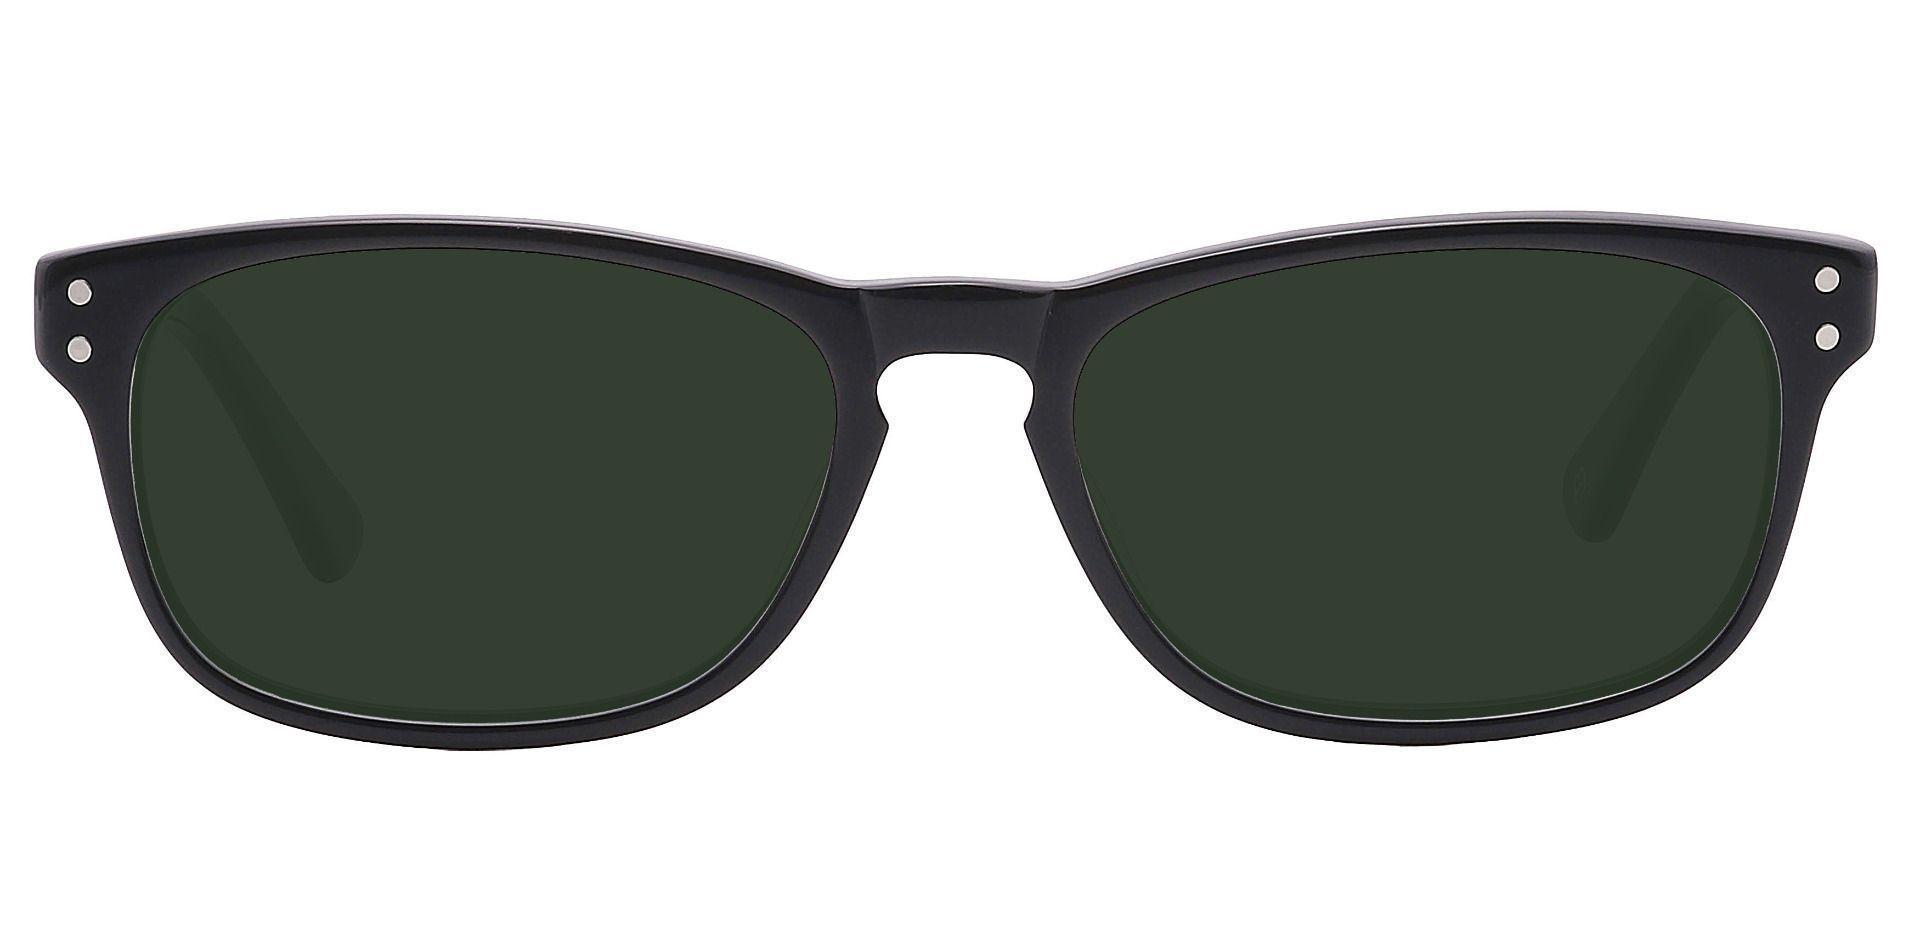 Morris Rectangle Non-Rx Sunglasses - Black Frame With Green Lenses